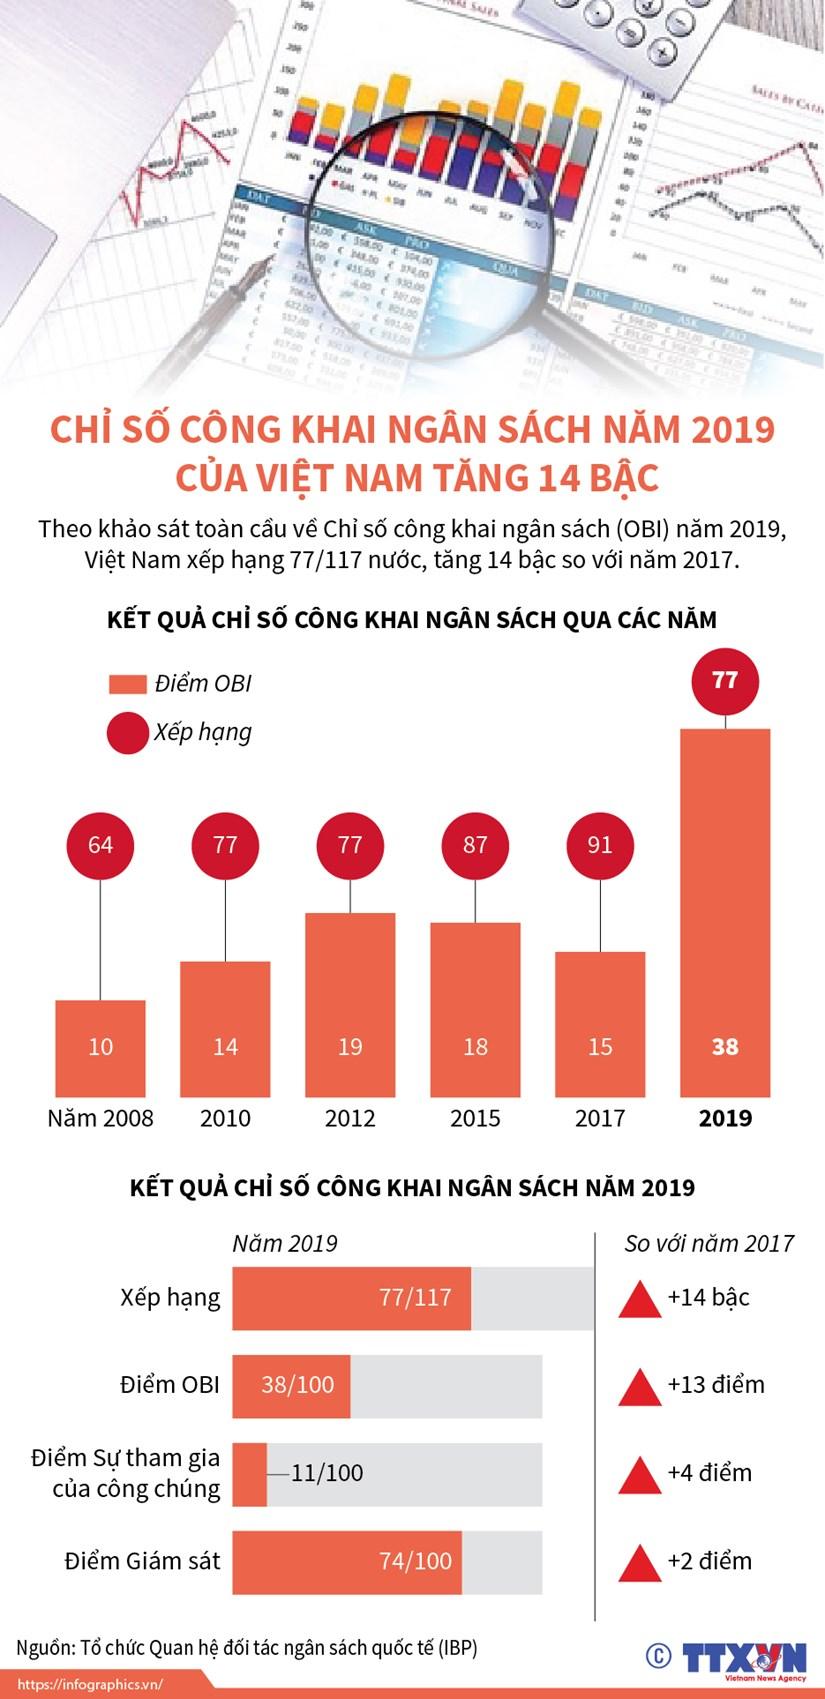 Chi so cong khai ngan sach nam 2019 cua Viet Nam tang 14 bac hinh anh 1